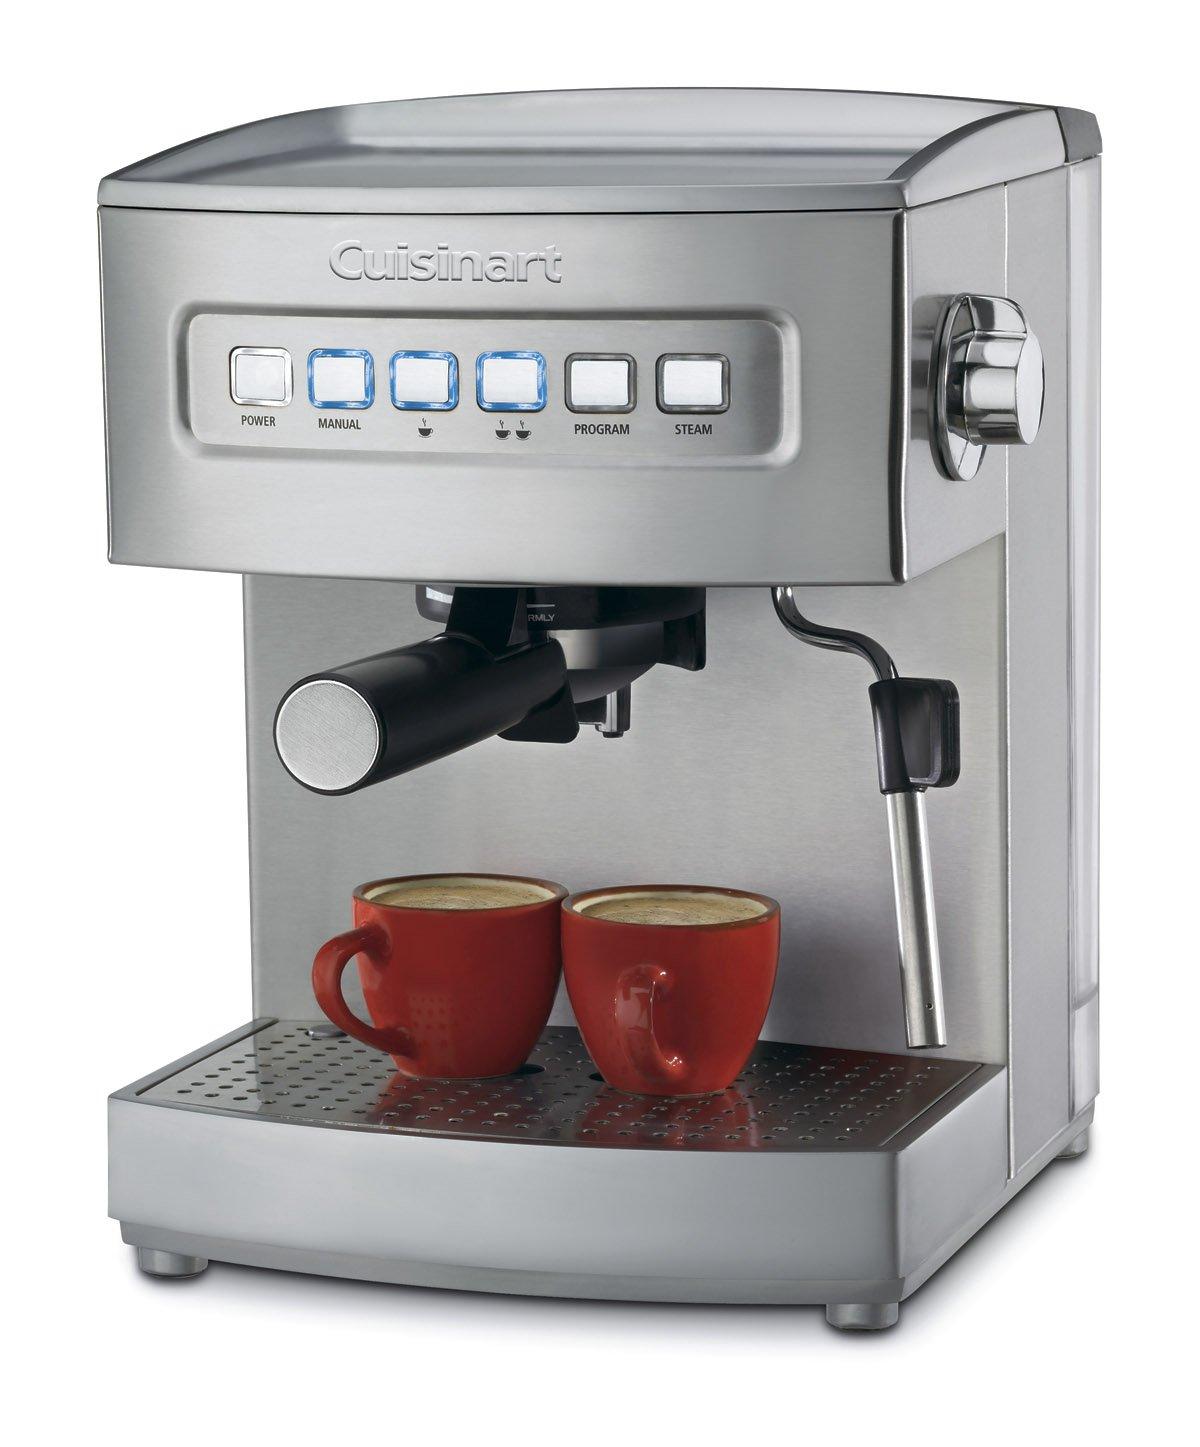 Cuisinart EM-200 Programmable 15-Bar Espresso Maker, Stainless Steel by Cuisinart